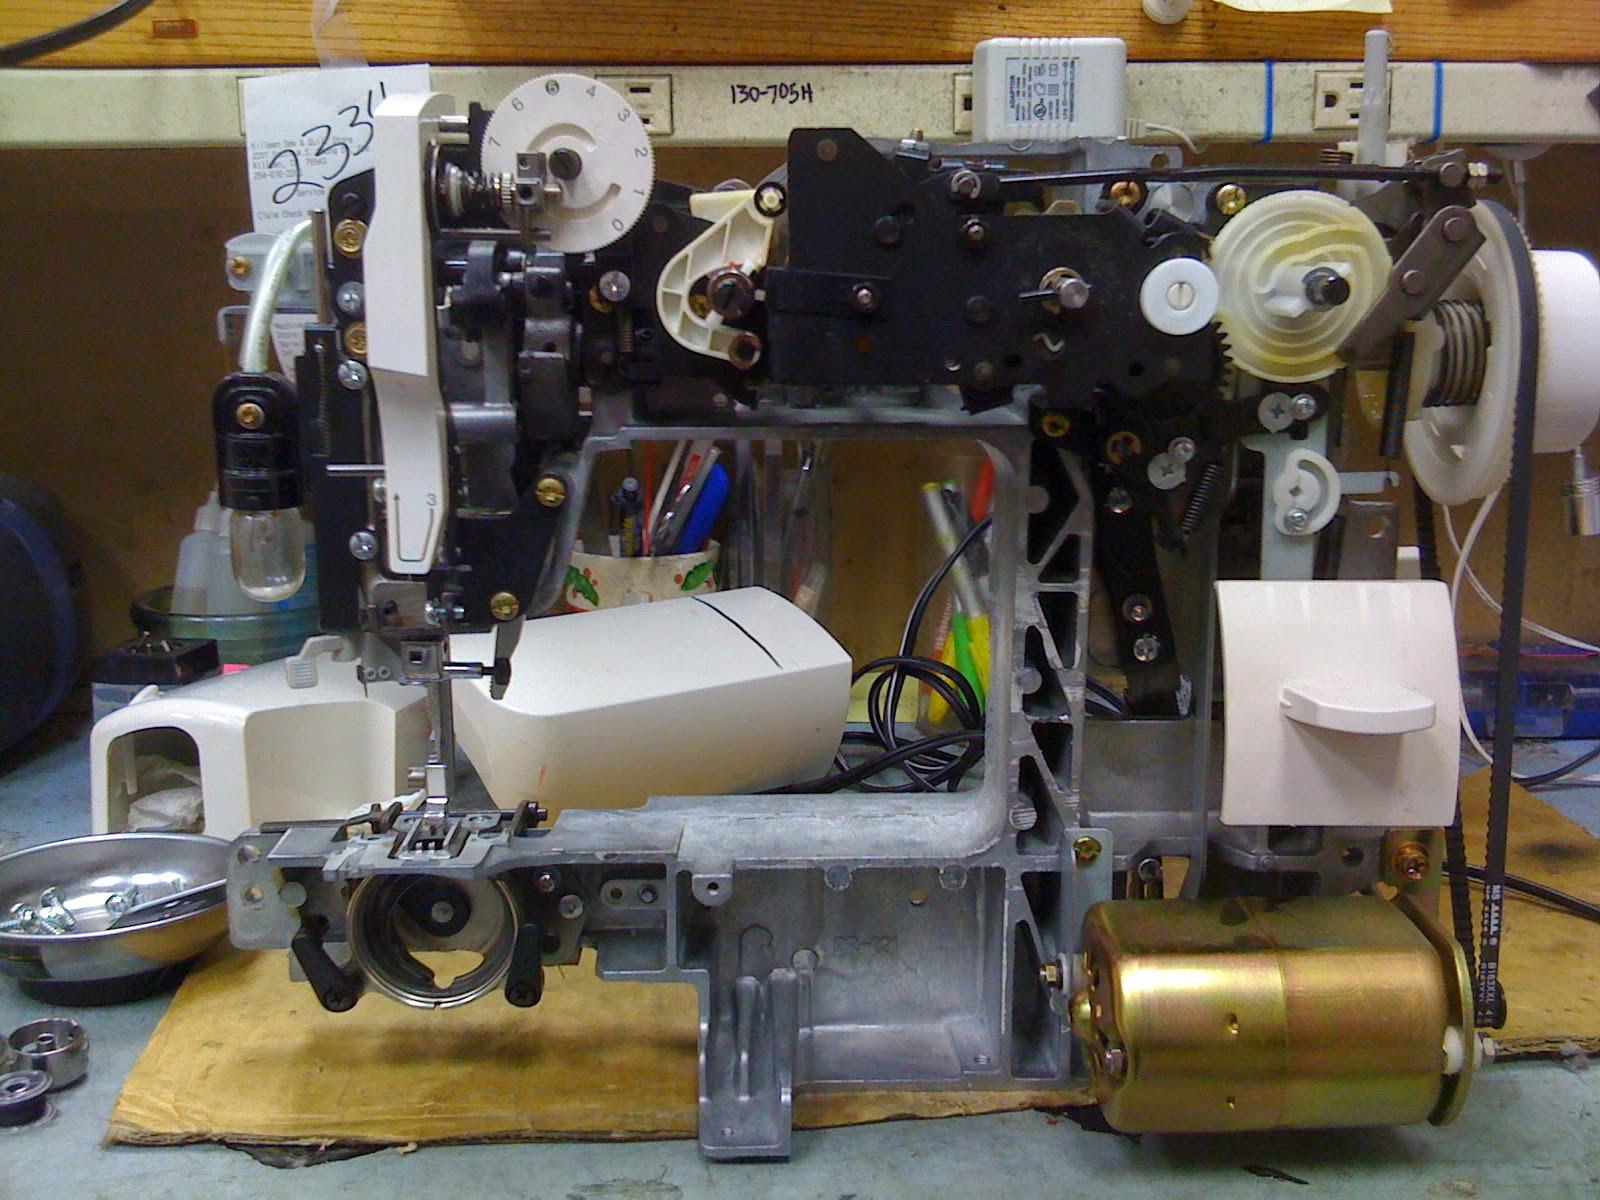 Sewing Machine Repair: Disassembly: How To Repair Sewing ...